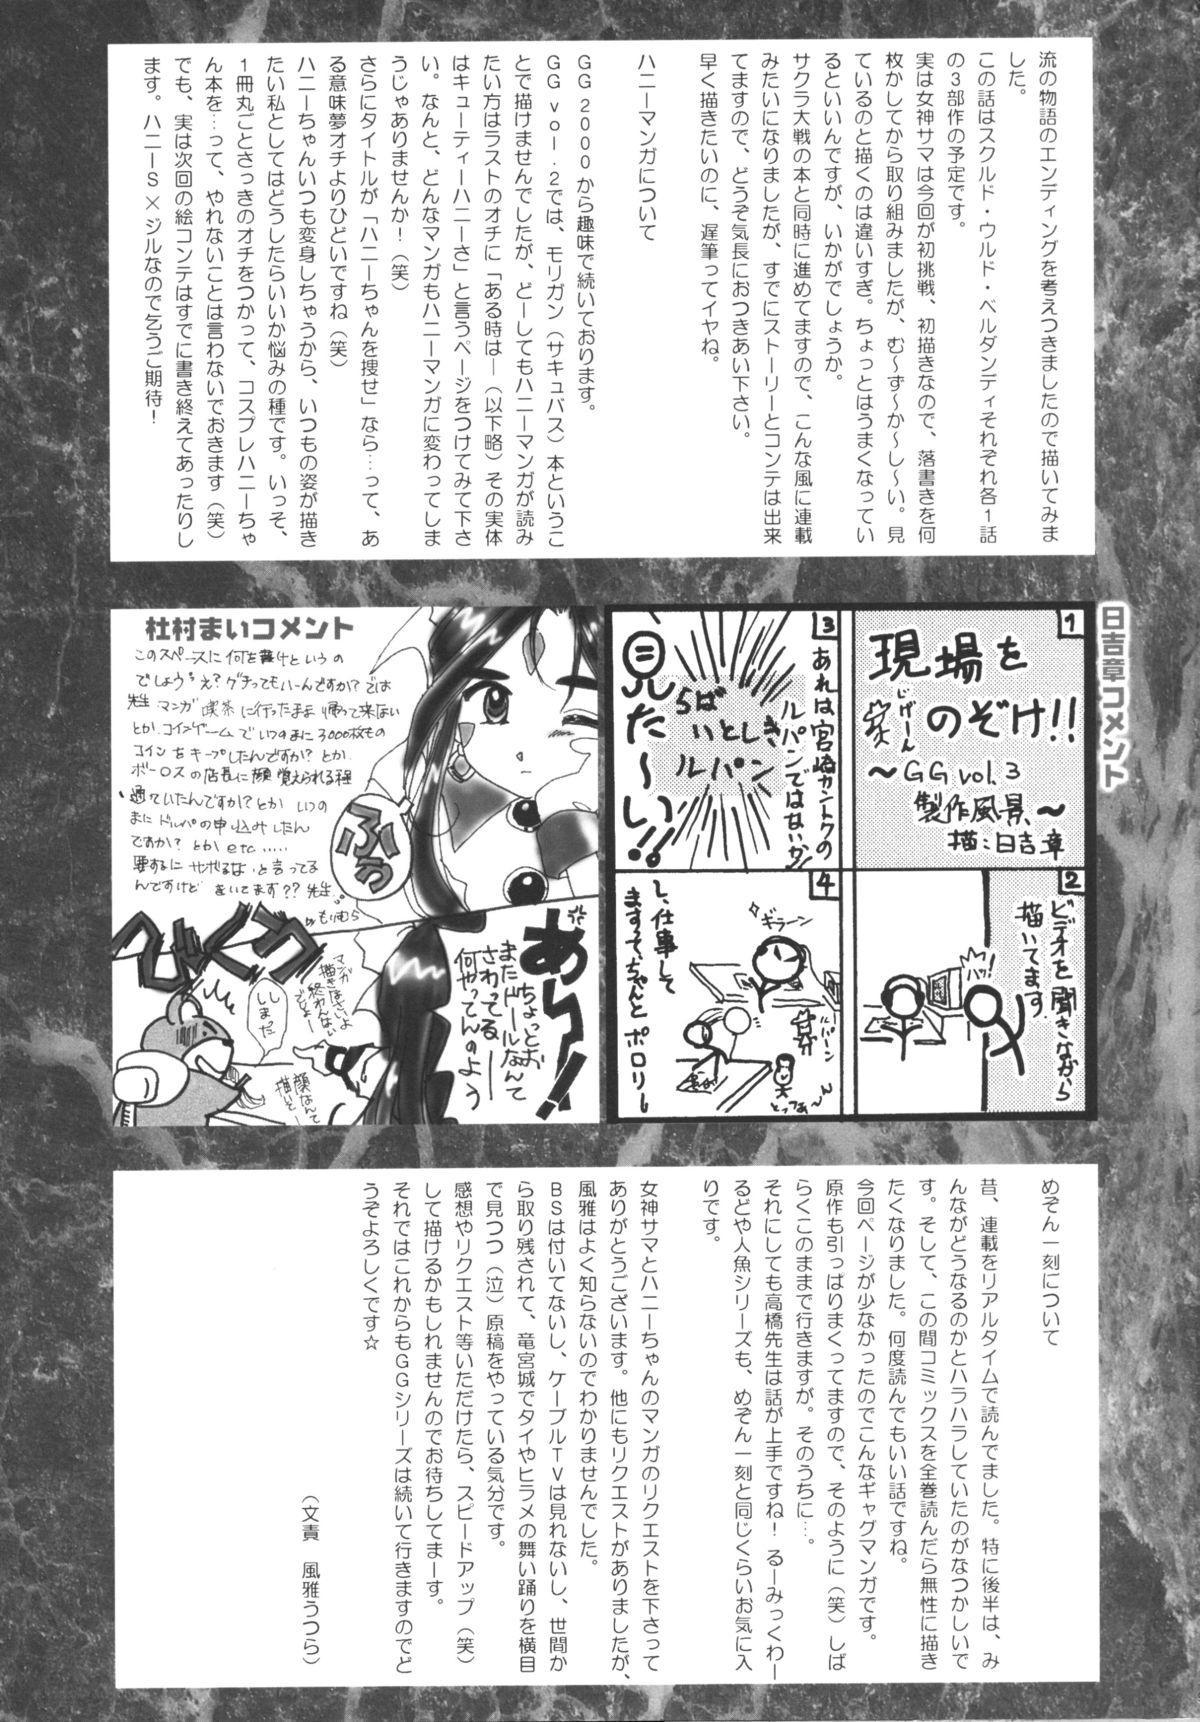 GG vol. 3 91